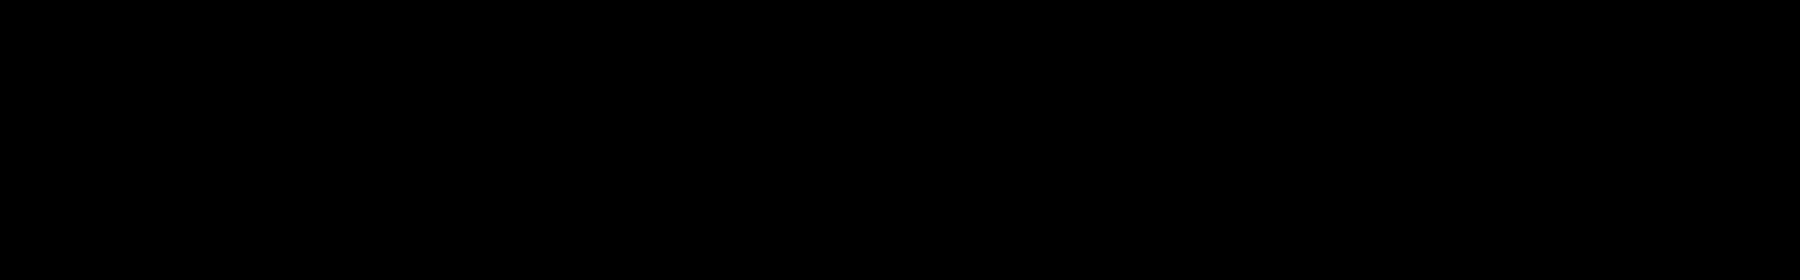 Trance Midi Collection Vol. 1 audio waveform